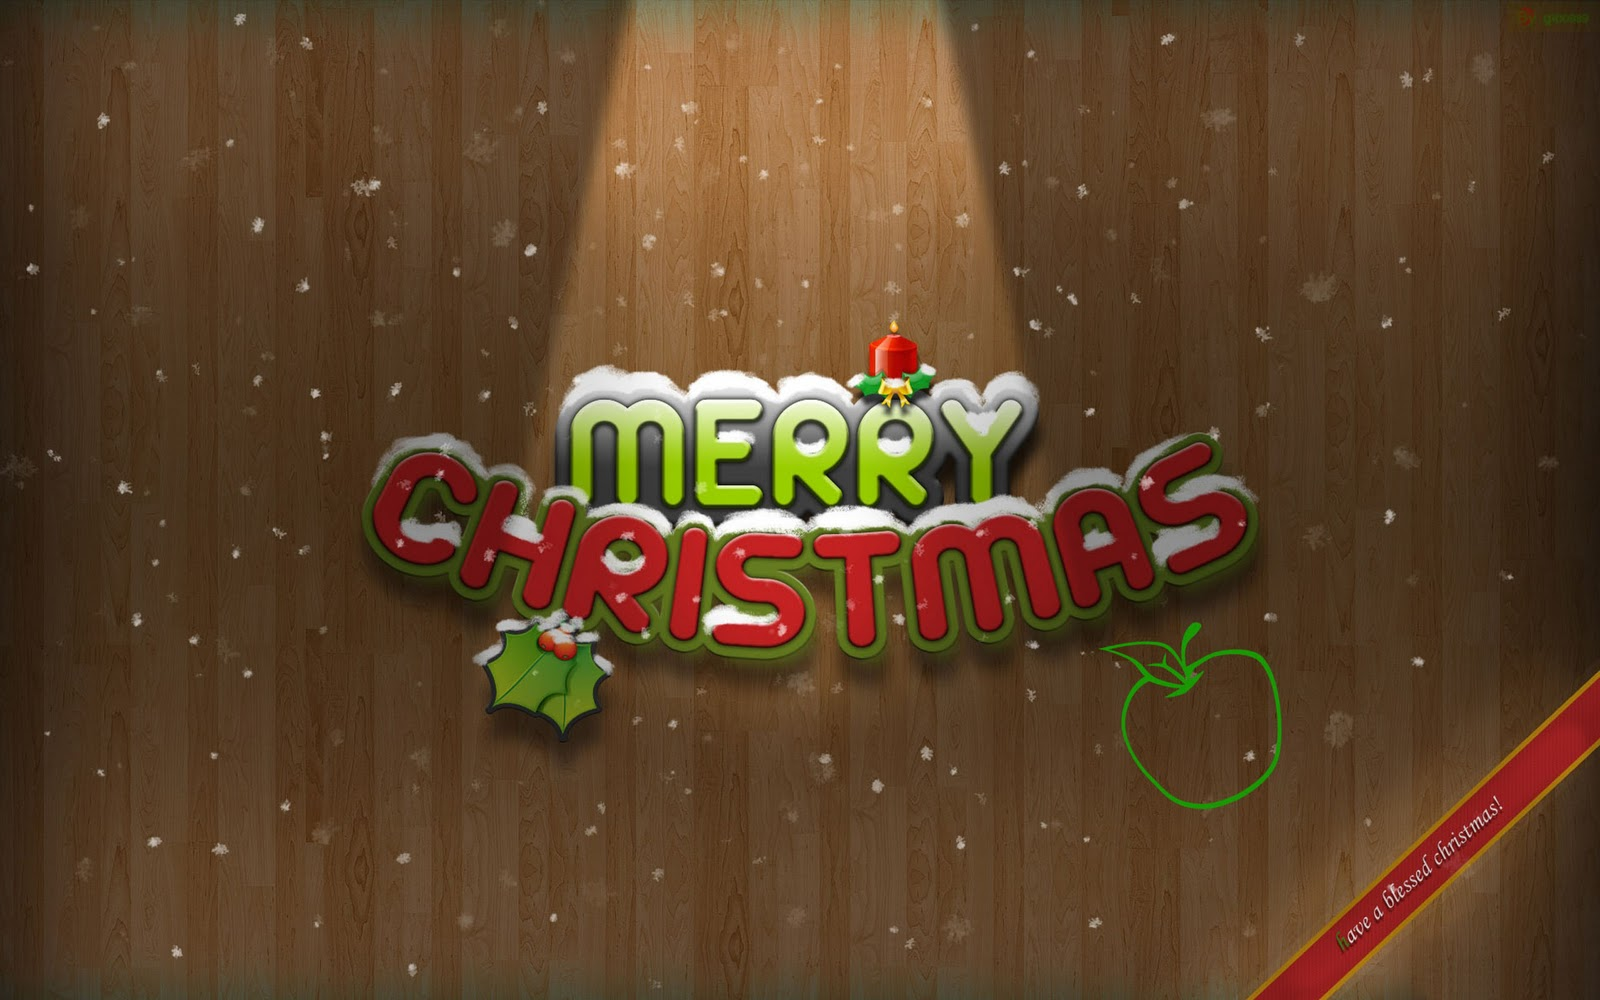 merry christmas desktop wallpaper free | christmaswallpapers18